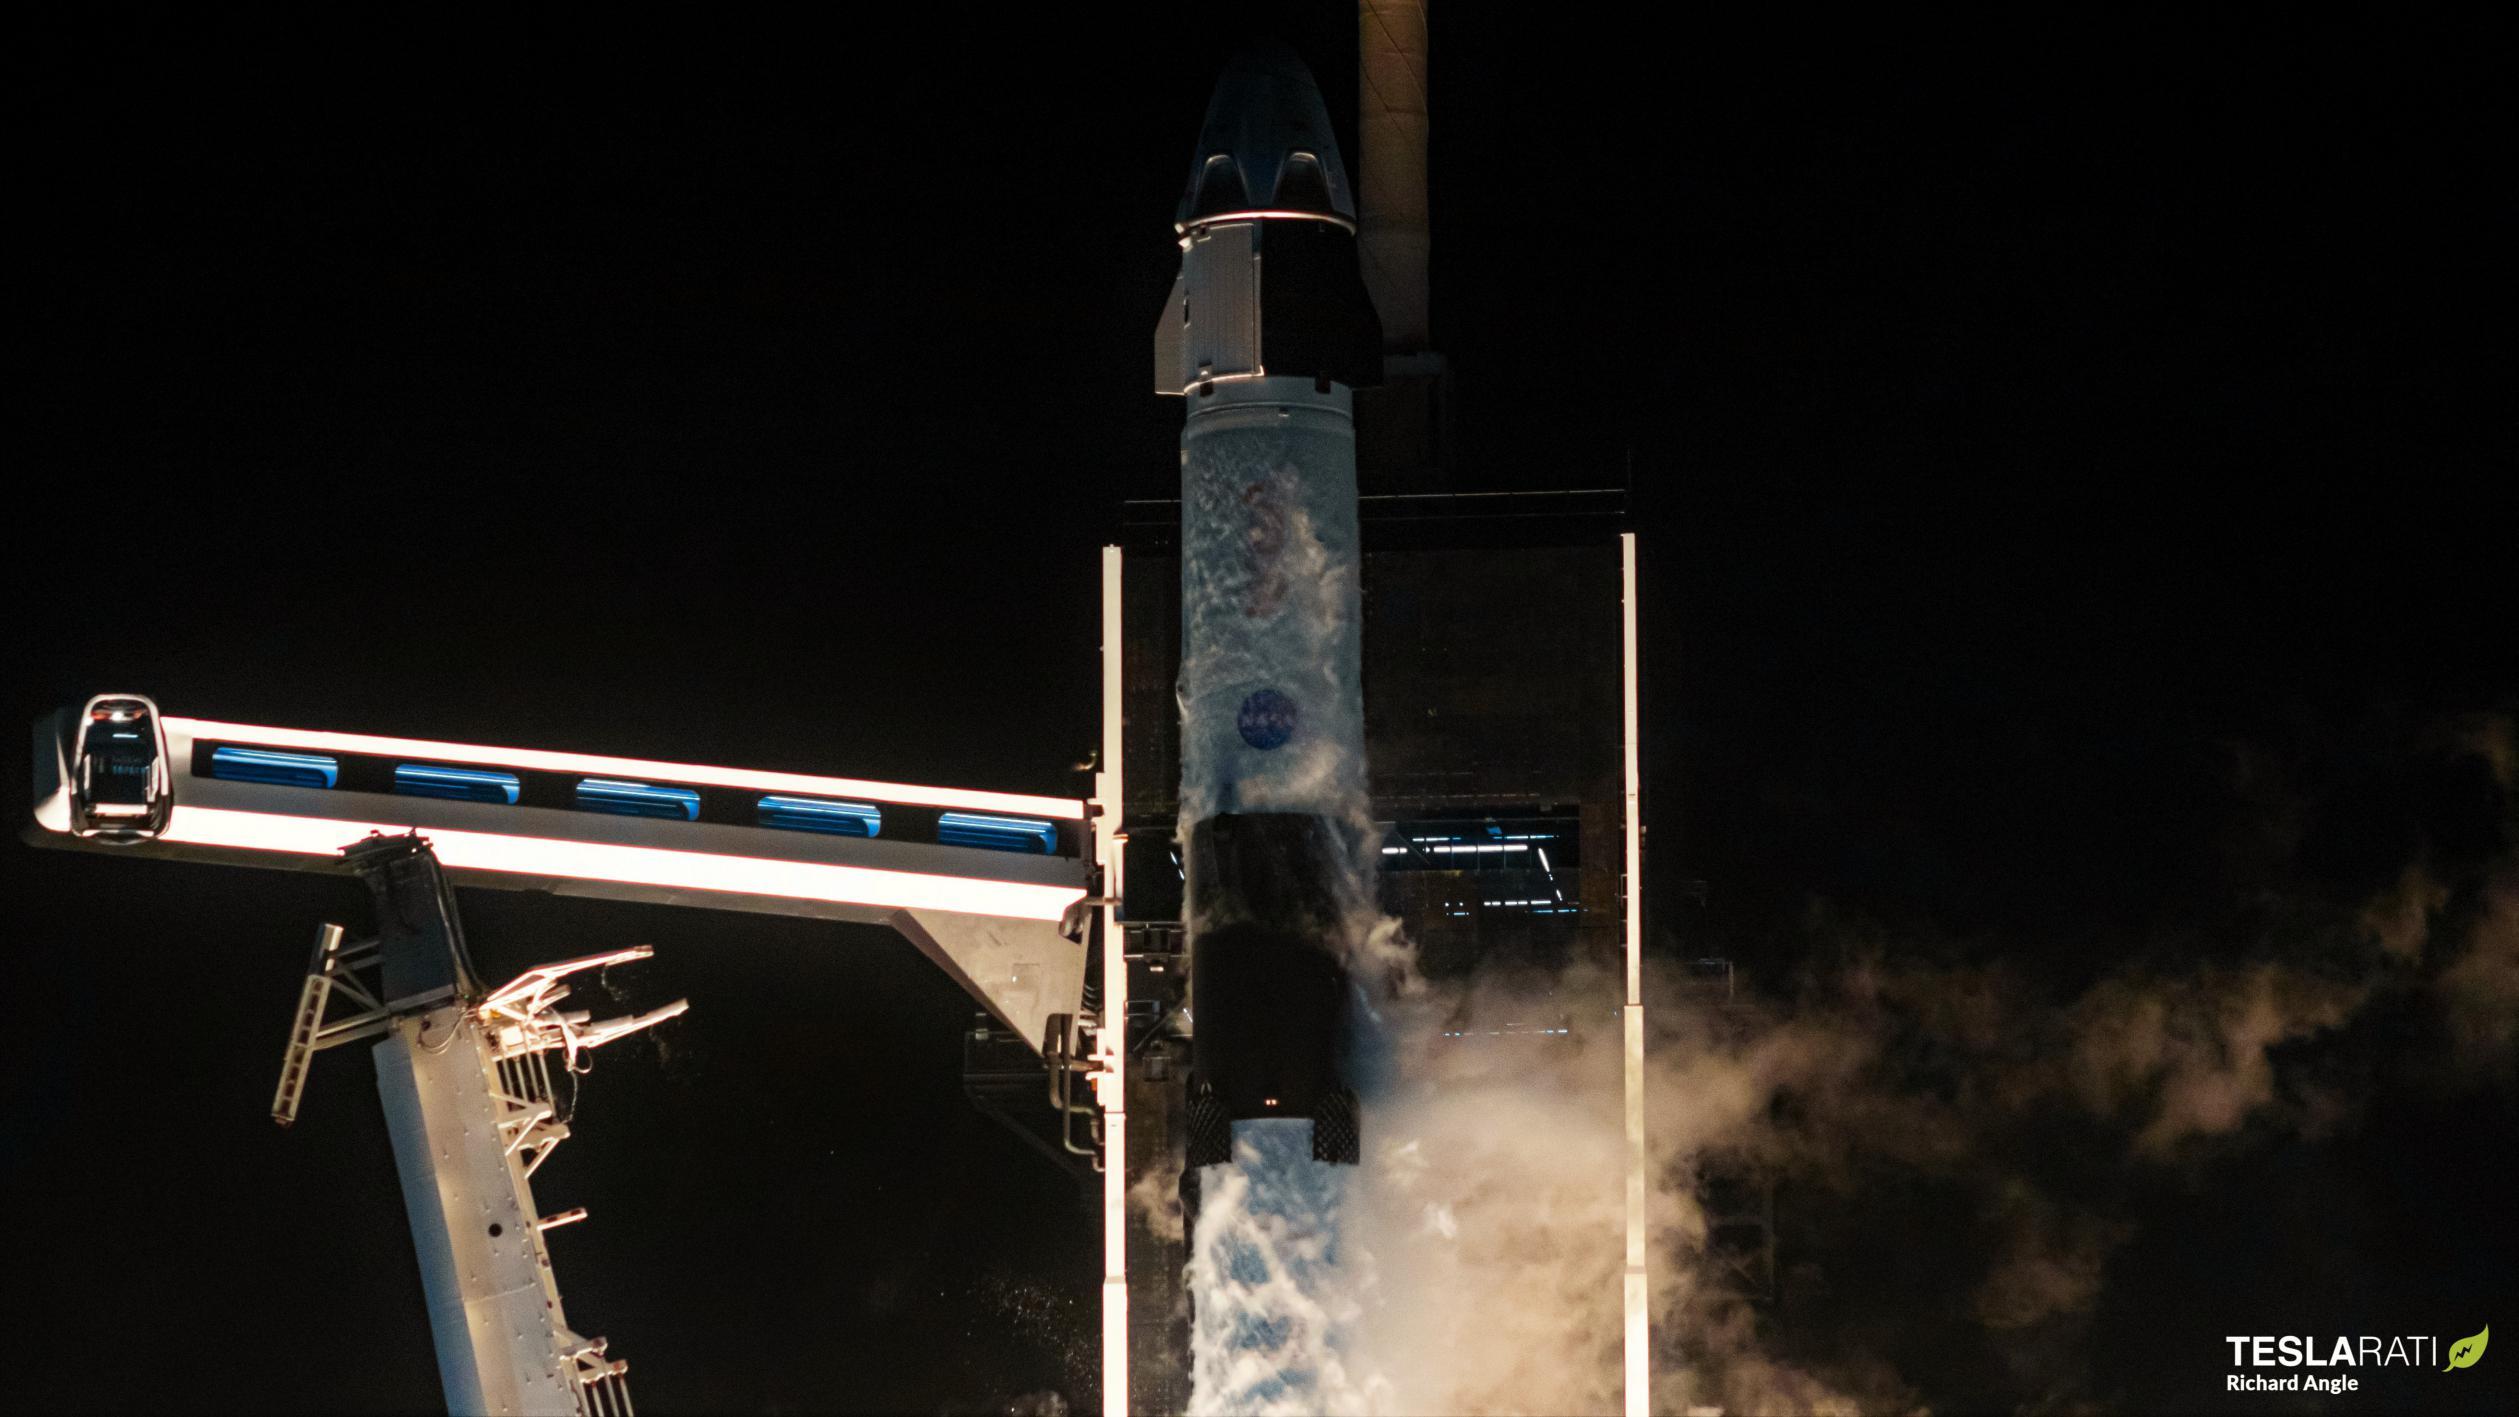 Crew-1 Crew Dragon C207 Falcon 9 B1061 39A 111520 (Richard Angle) launch 2 crop (c)